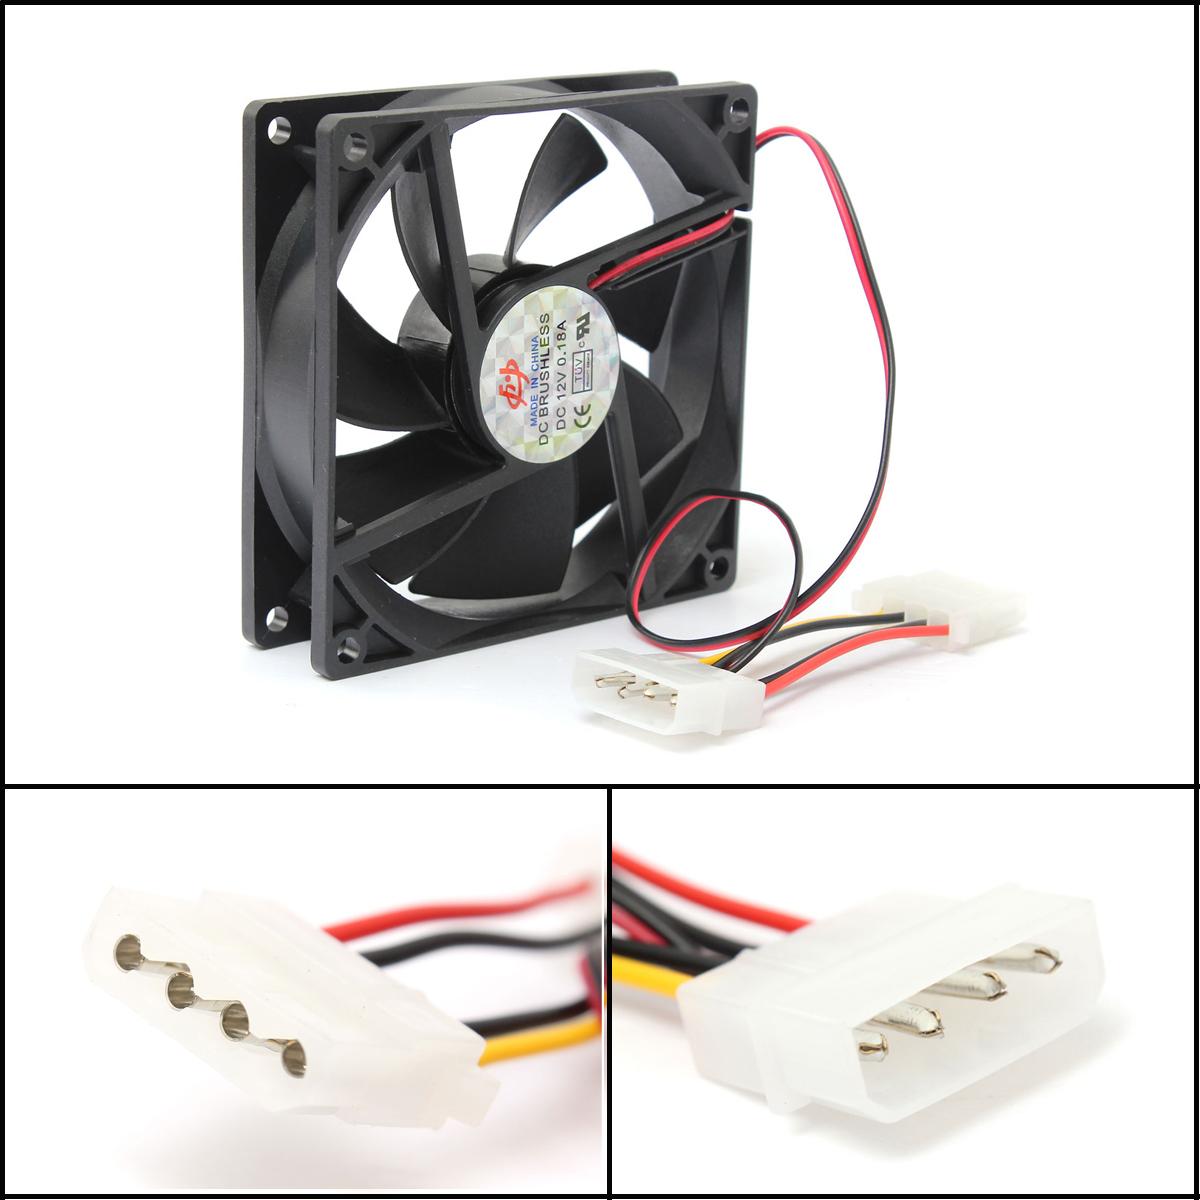 4x led ventilateur cpu fan bleu lumineux 4 pin ordinateur bureau laptop pc 80 mm ebay. Black Bedroom Furniture Sets. Home Design Ideas